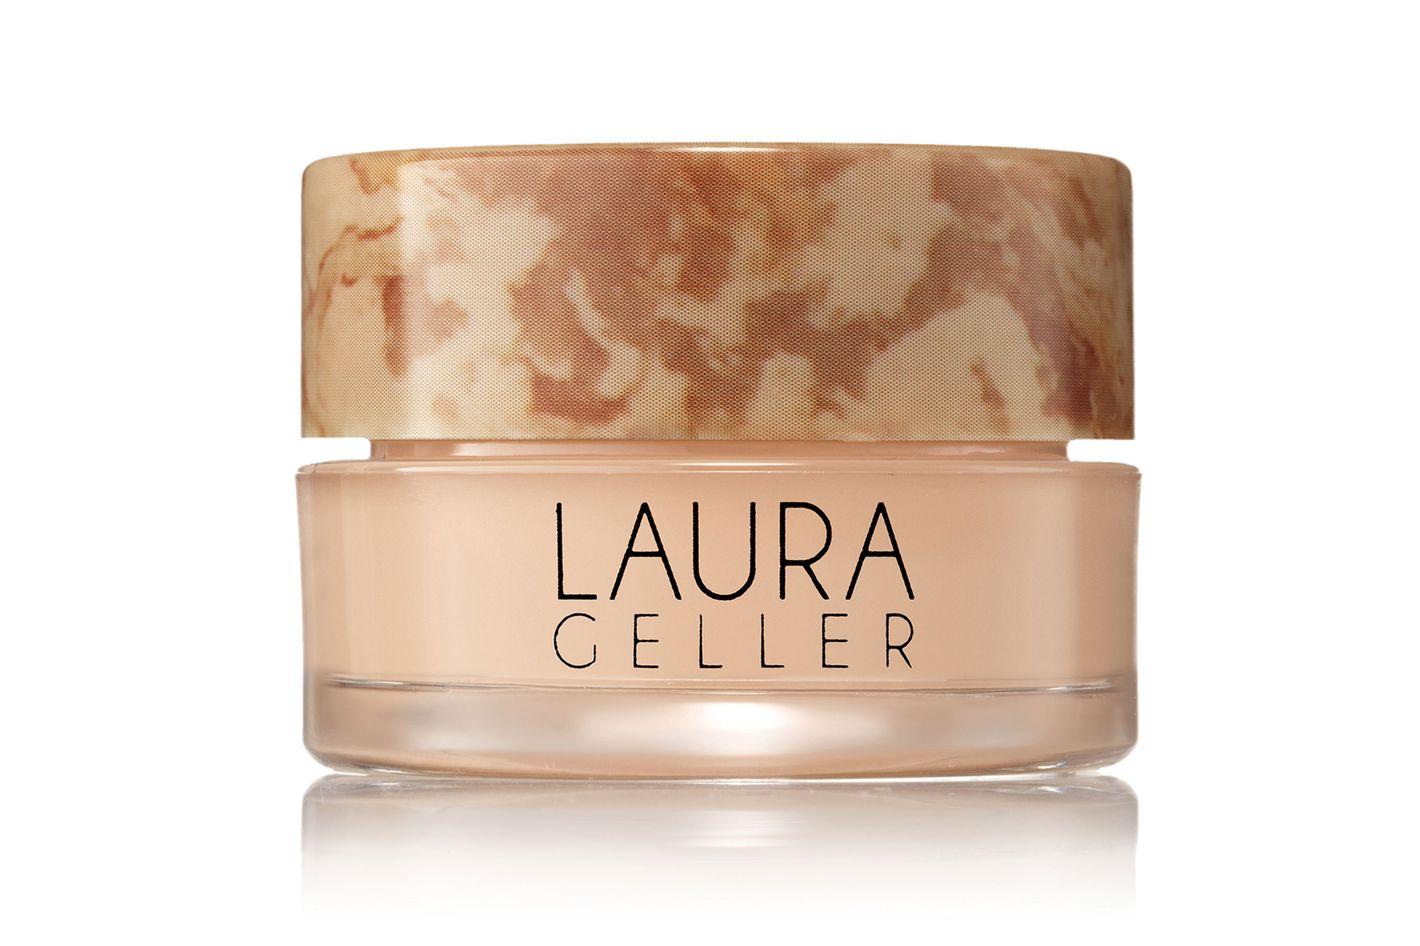 Laura Geller Baked Radiance Cream Concealer